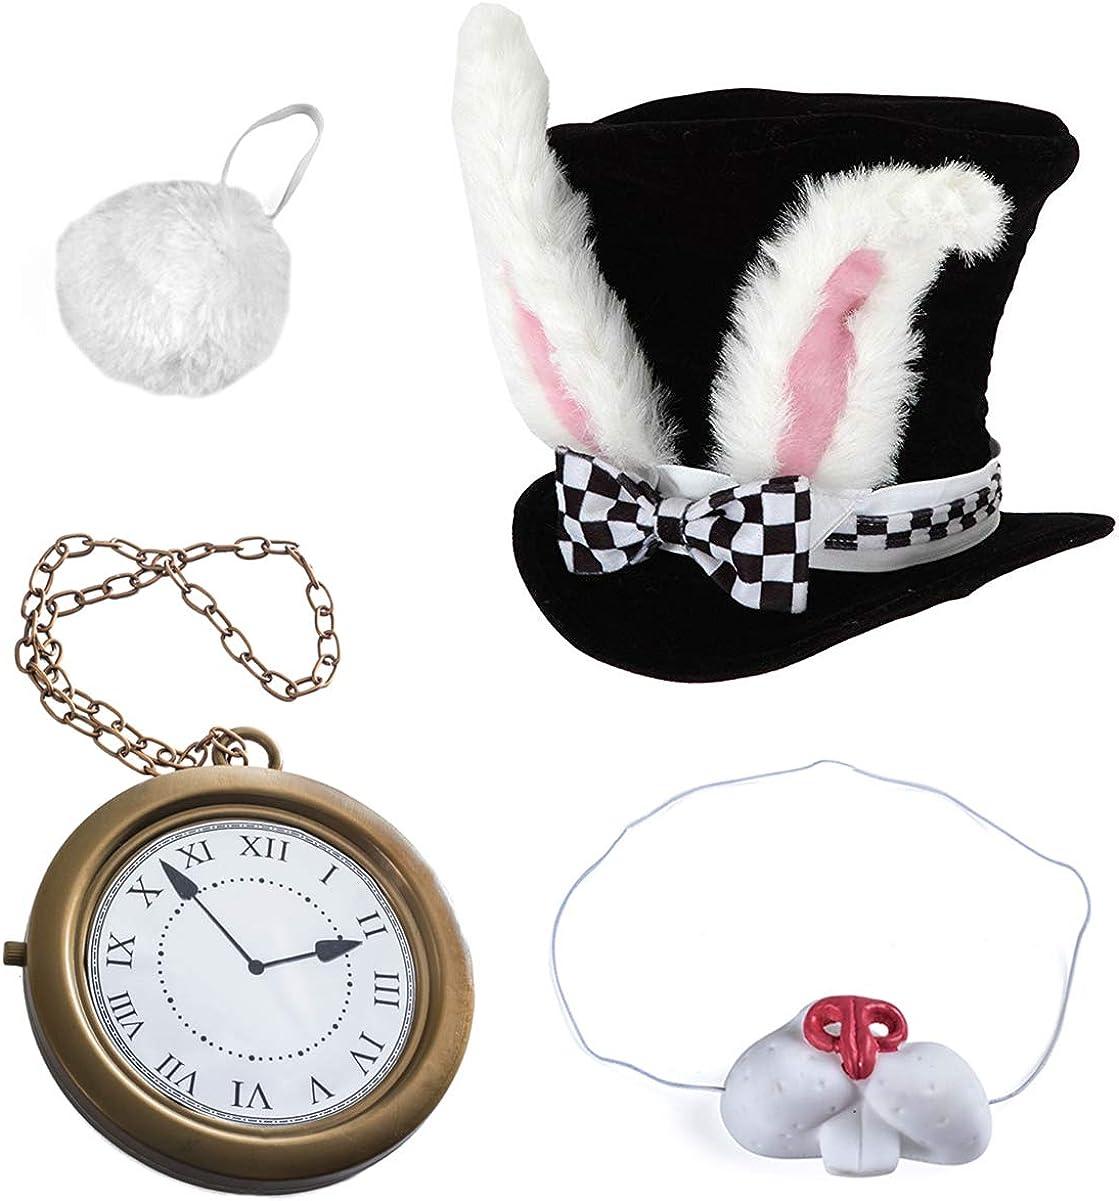 Tigerdoe White Rabbit Costume - Rabbit Costume - Bunny Costume (4 Pc Costume)- Playing Cards Costume 4 Pk